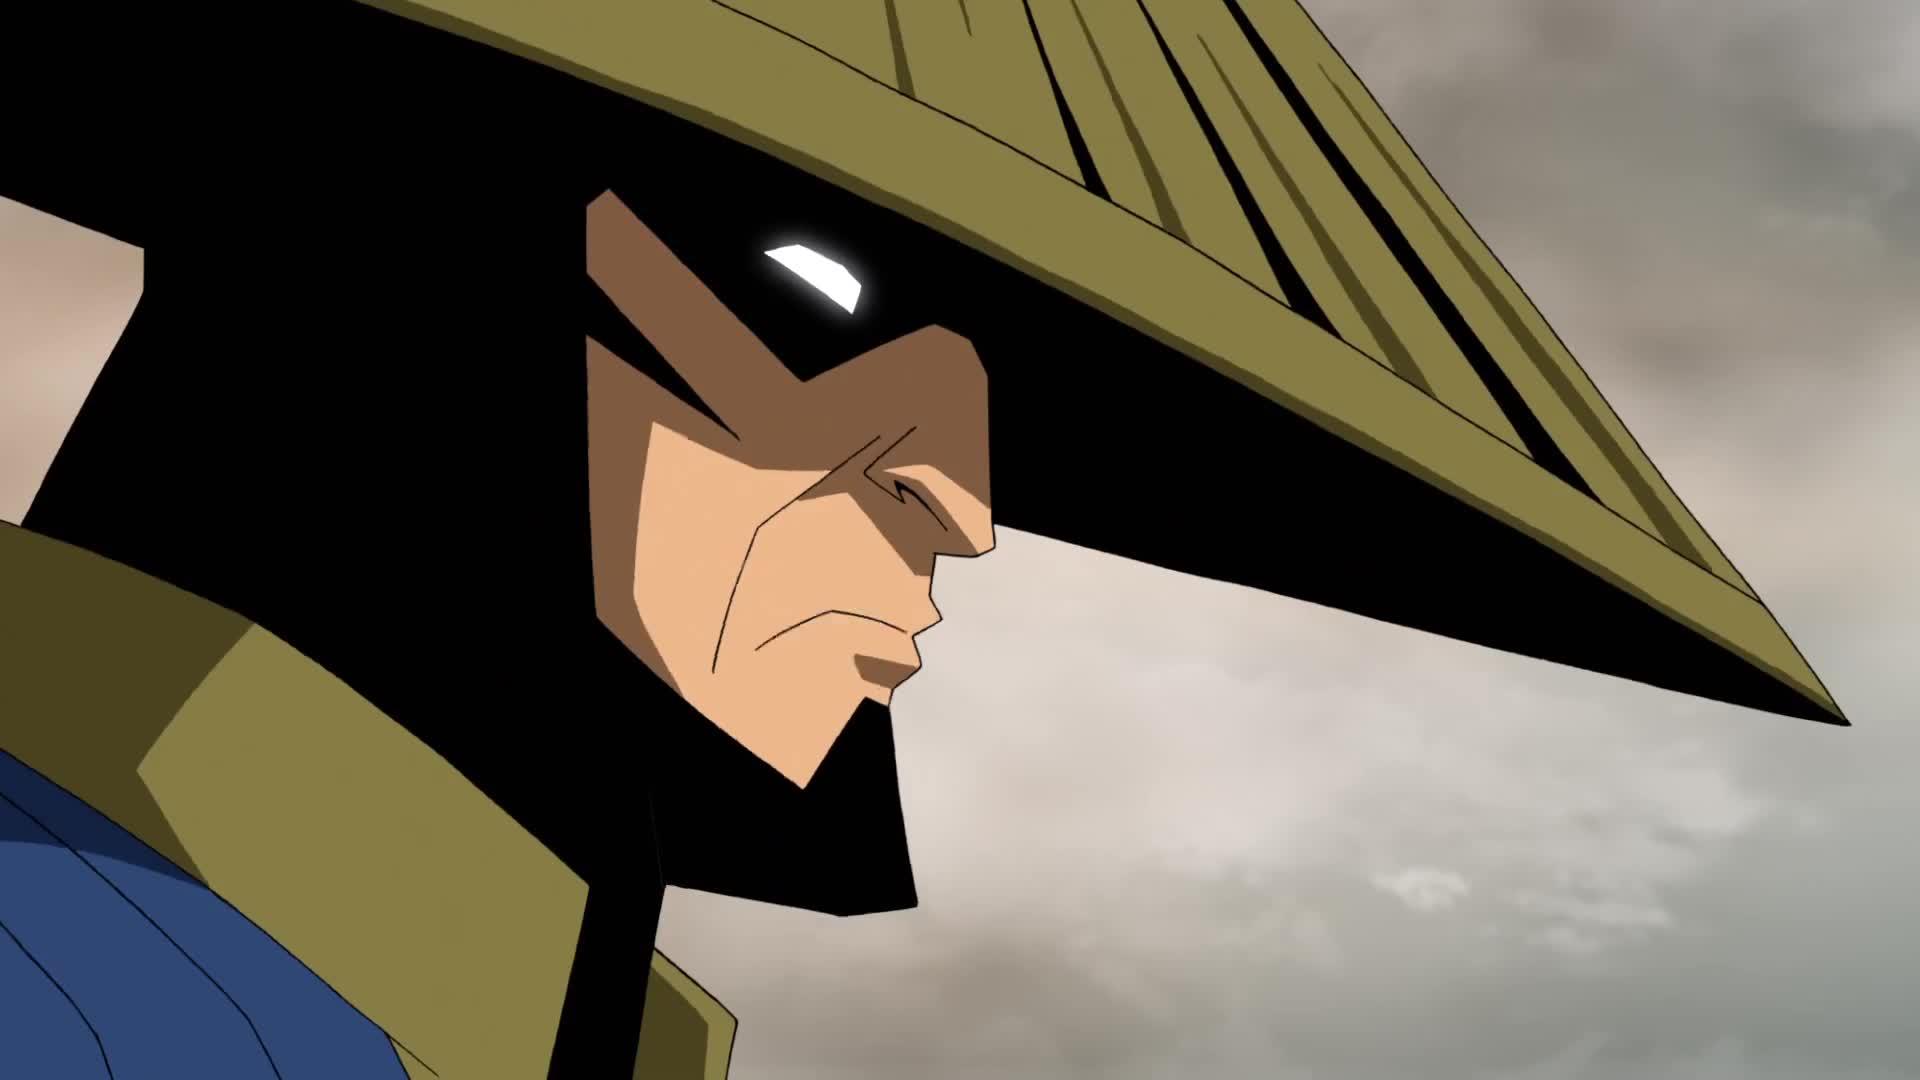 Trailer, Warner Bros., Animation, Mortal Kombat, NetherRealm, Trickfilm, Mortal Kombat Legends: Scorpion's Revenge, Mortal Kombat Legends, Scorpion's Revenge